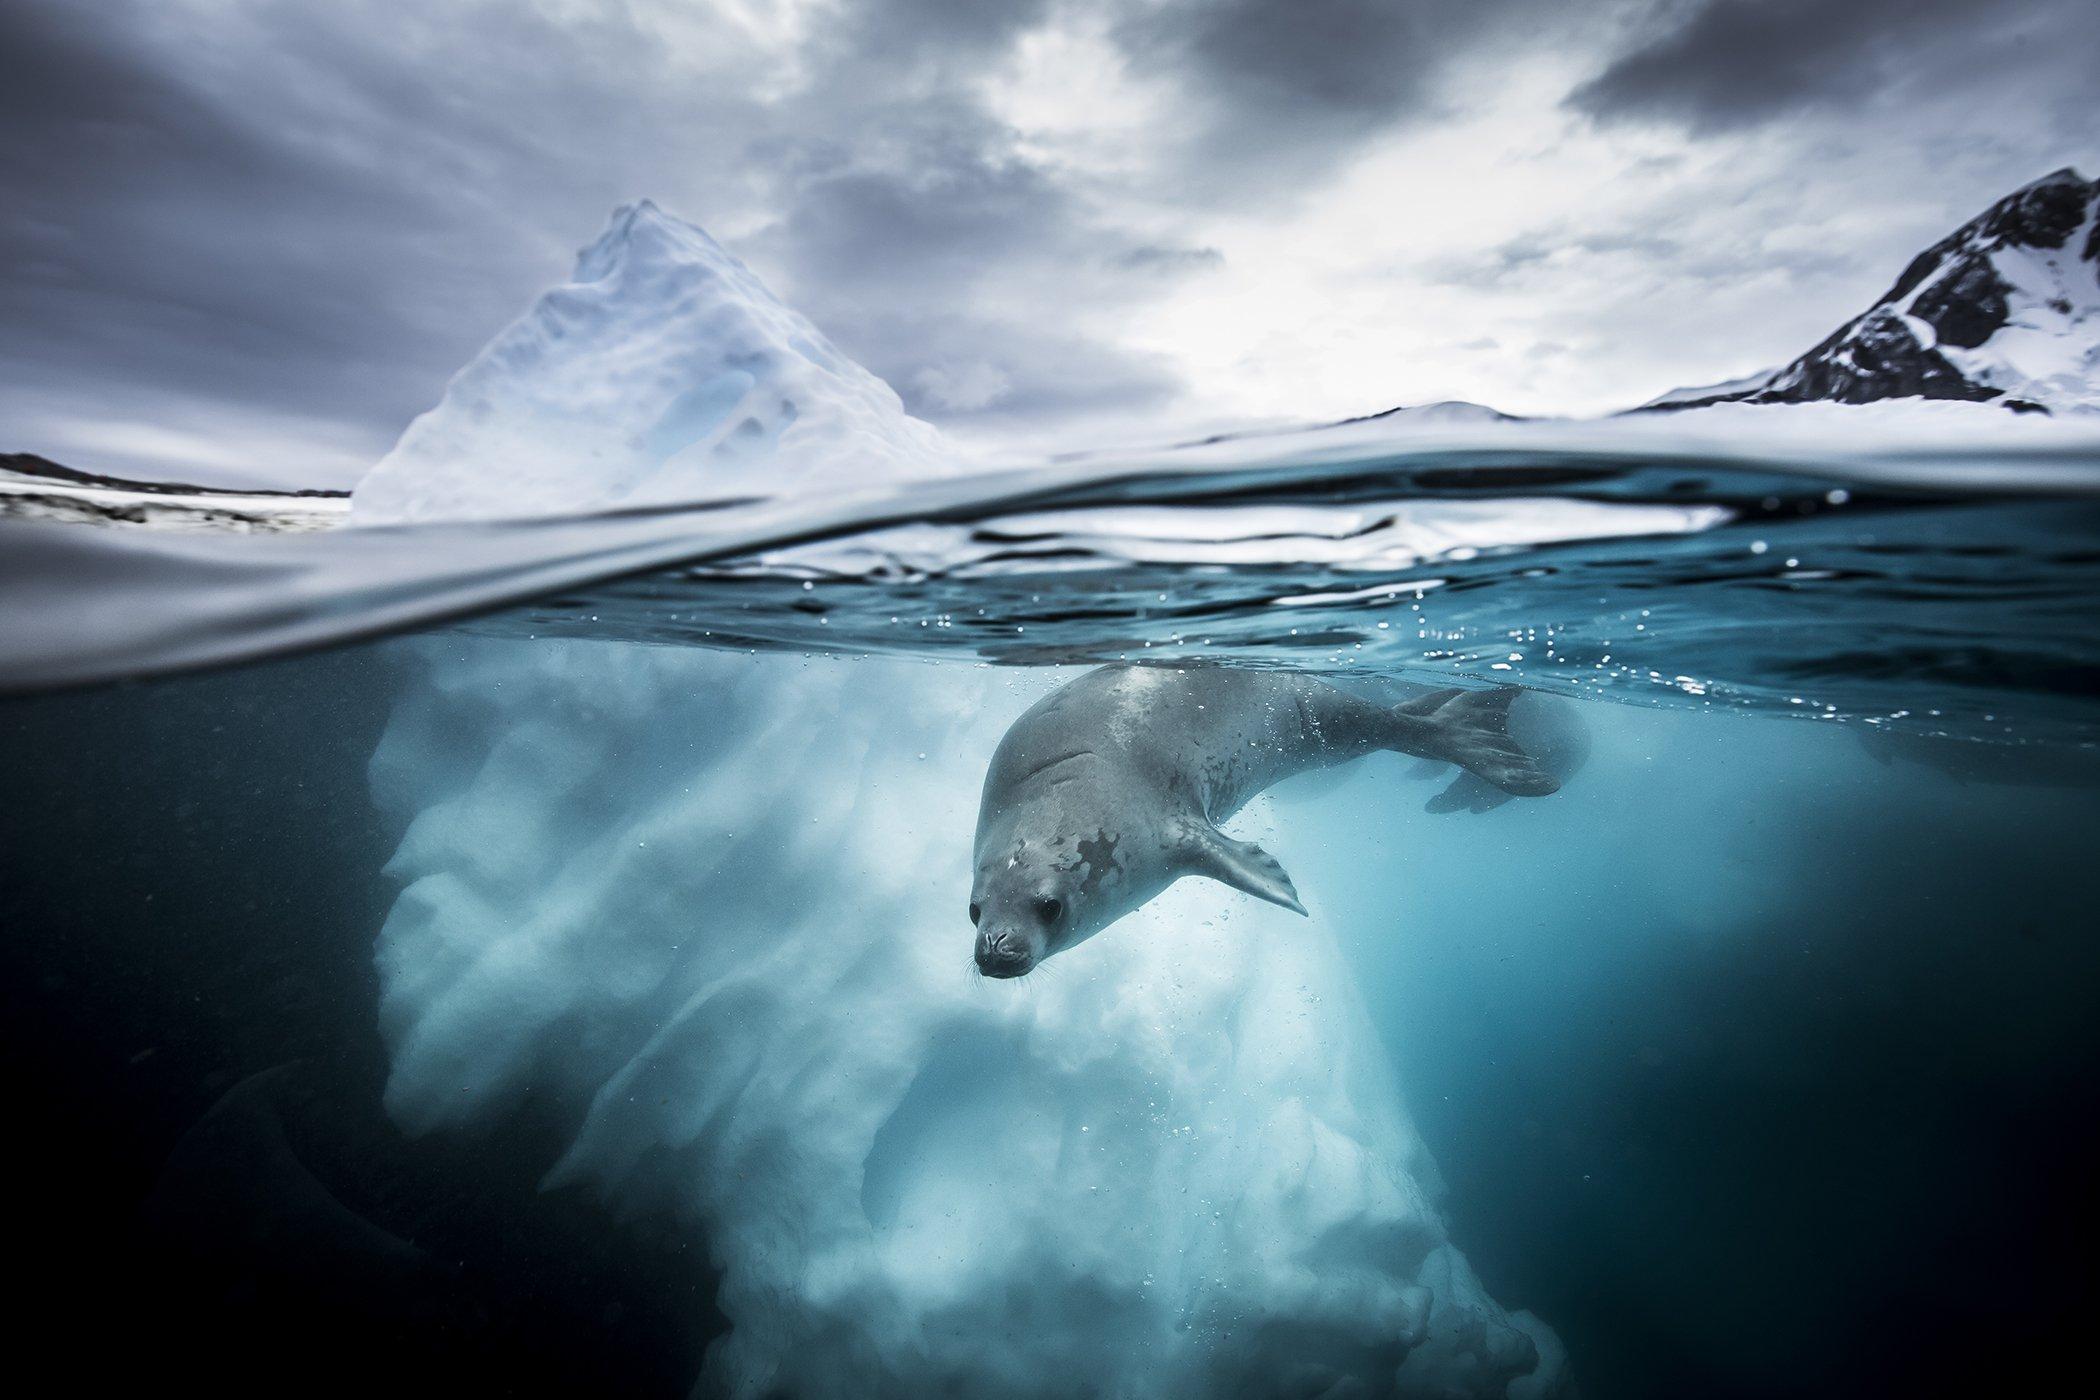 UnderwaterPhotographerOfTheYear_102JESSICAFARRER_002.jpg